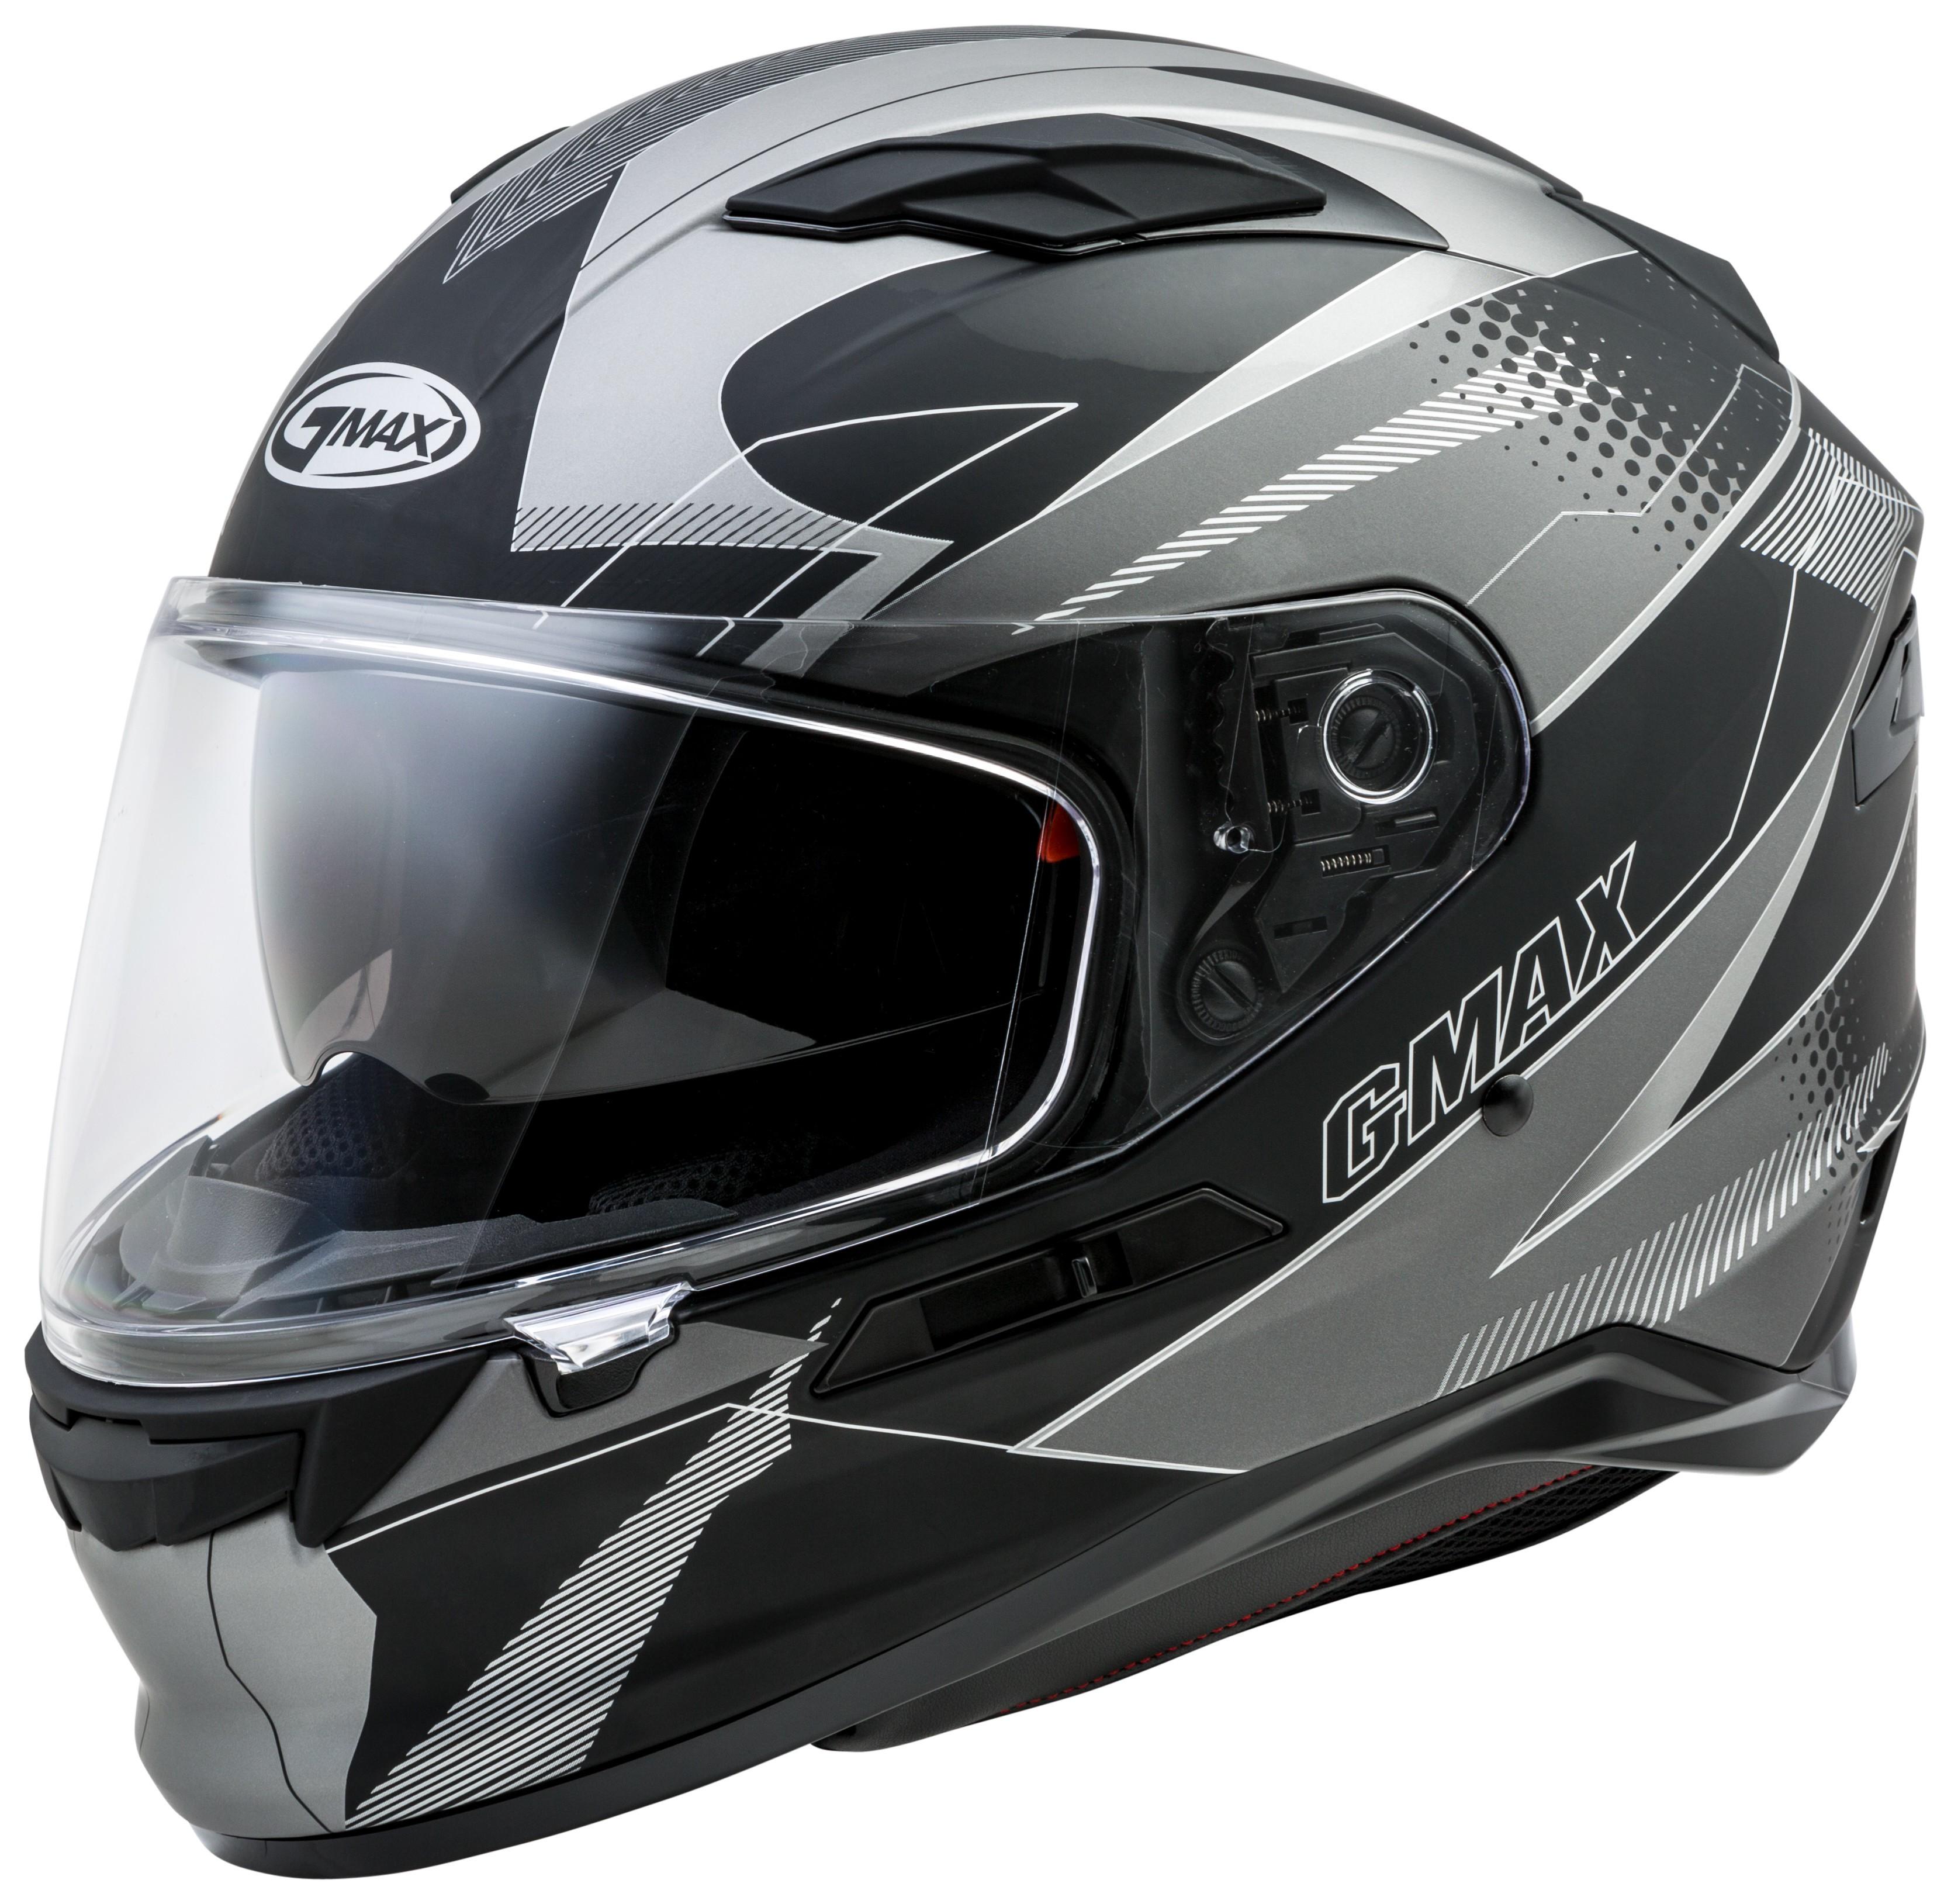 g_max_ff98_apex_helmet.jpg